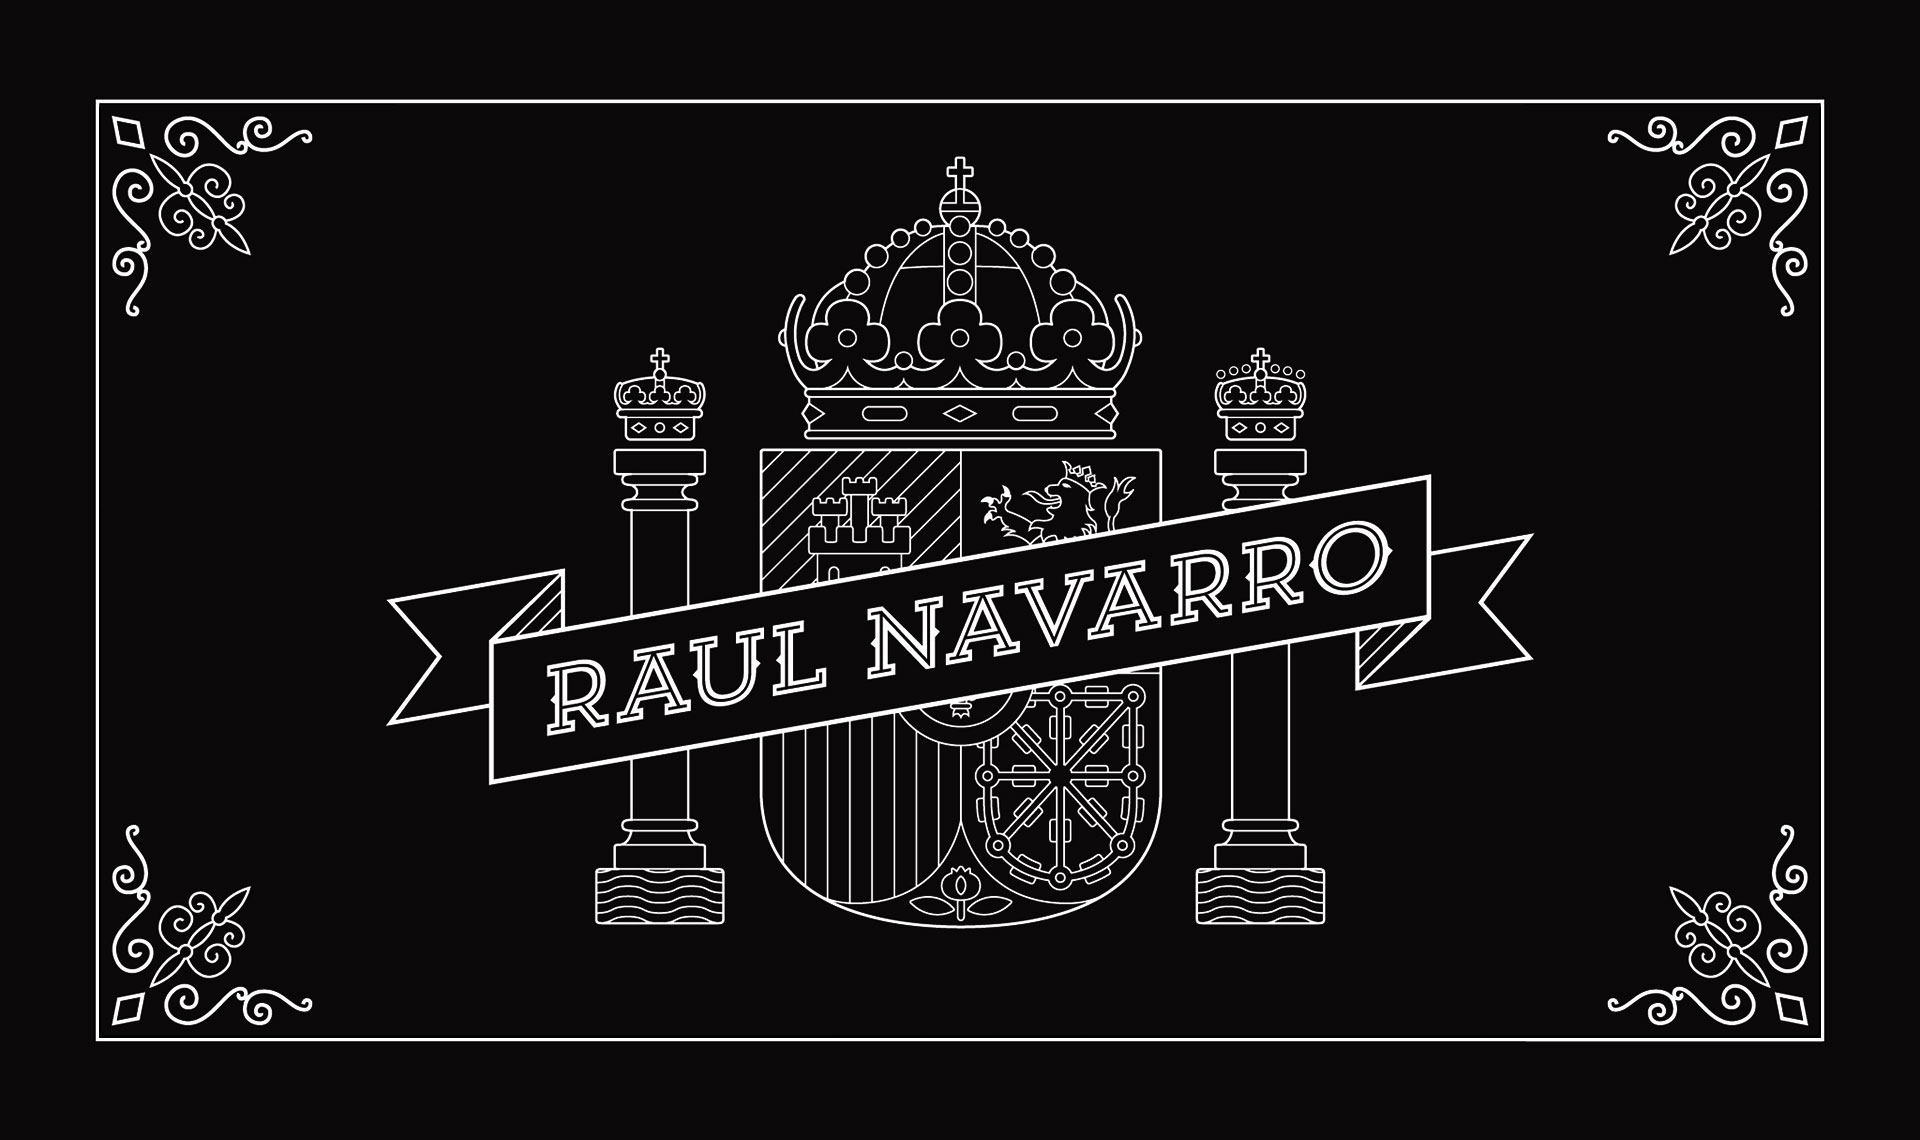 Adidas_Screens_Resized_Navarro.jpg